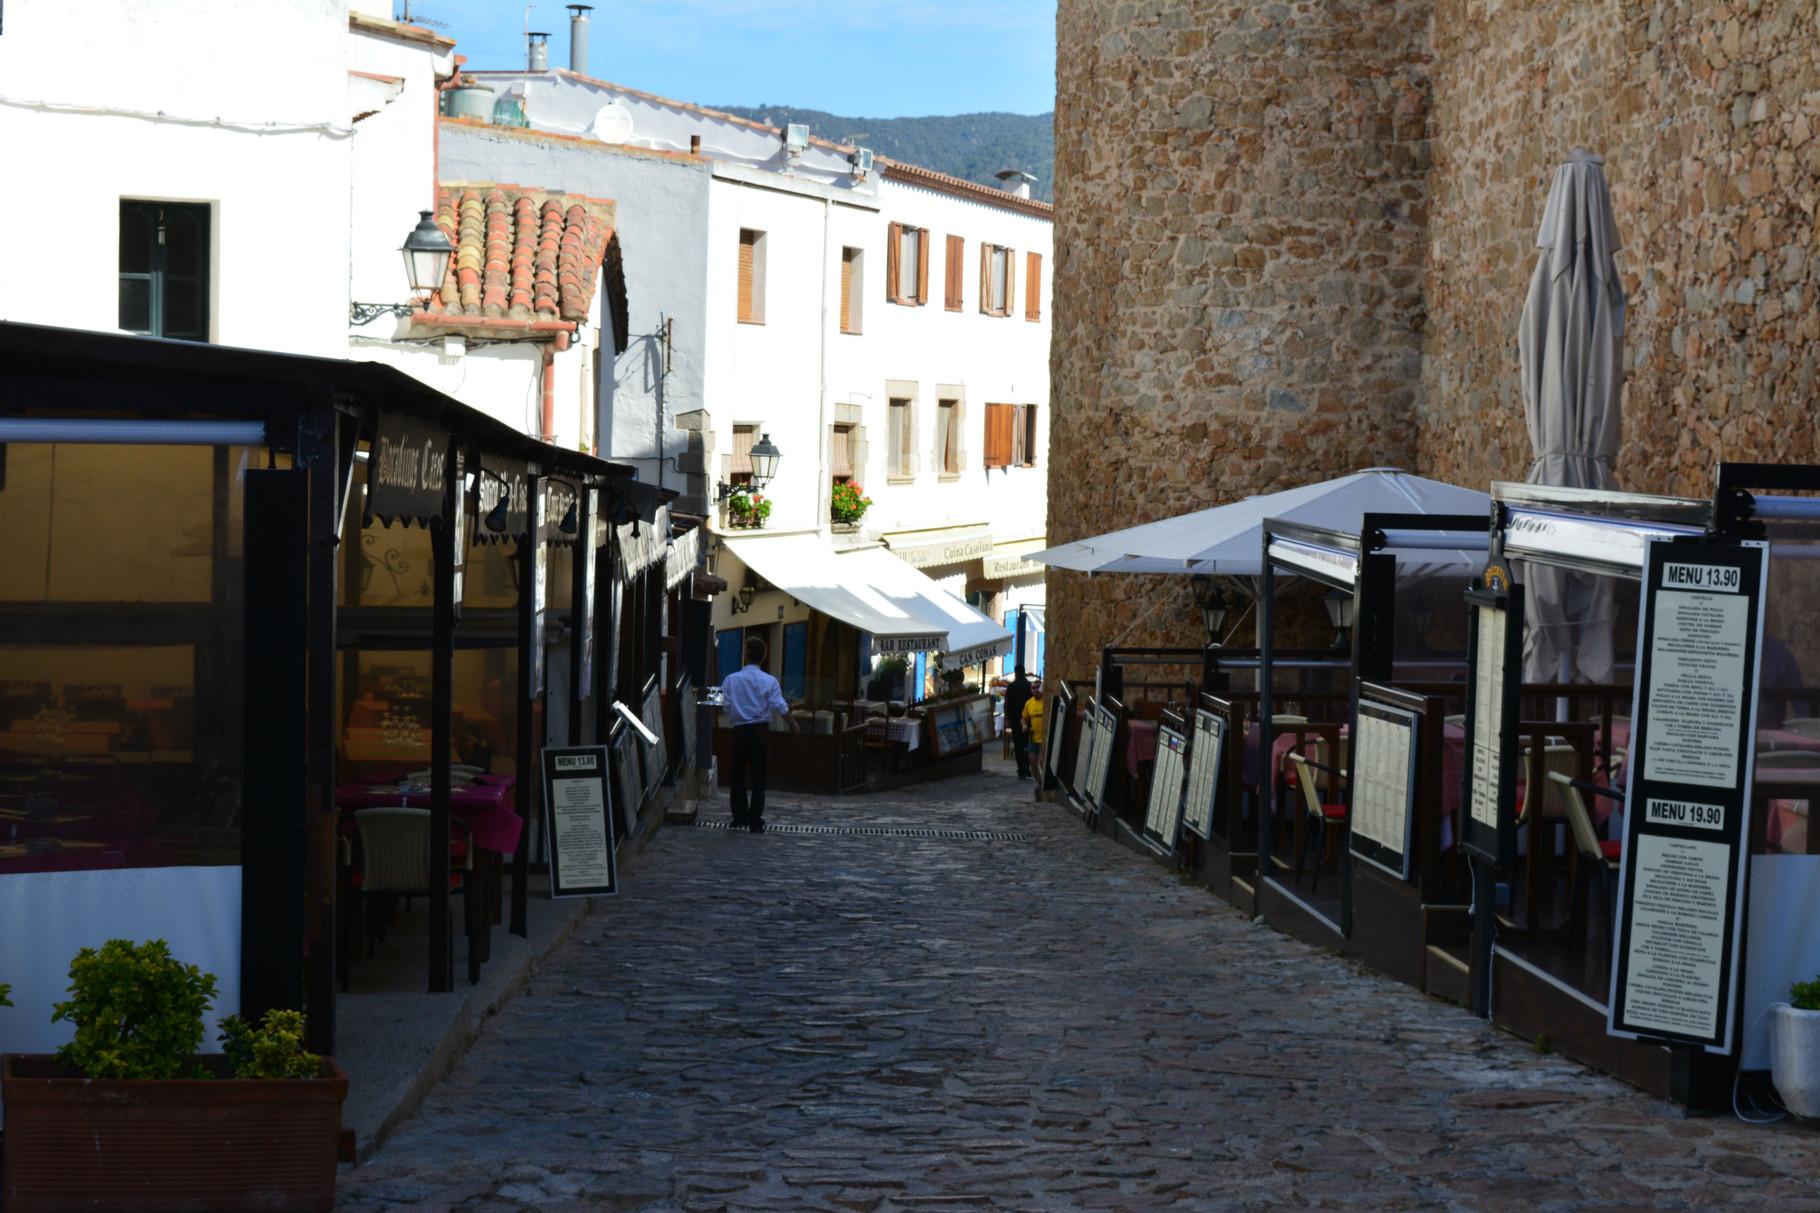 Calle del castillo de restaurantes